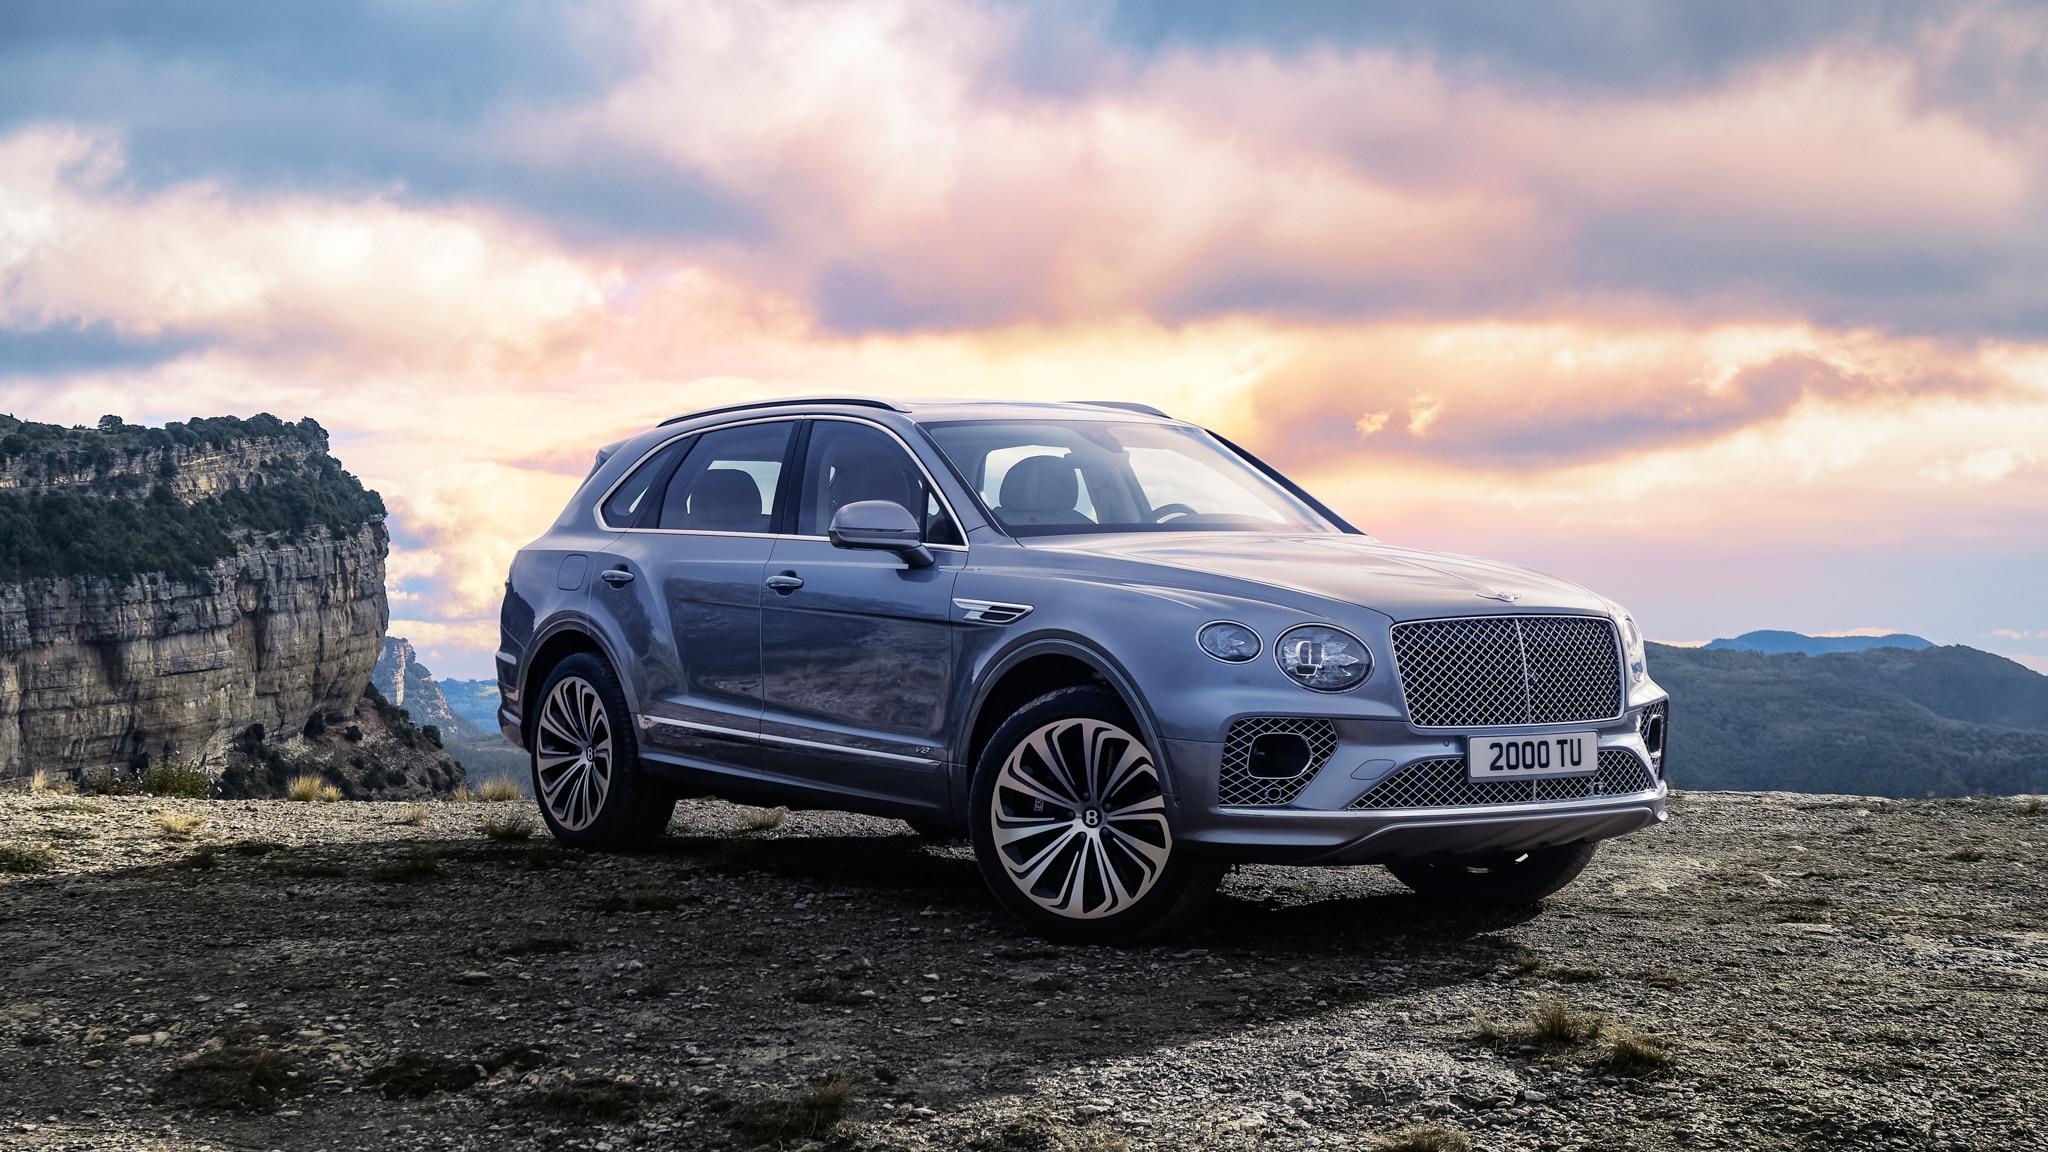 New 2021 Bentley Bentayga Less Ugly More Infotaining